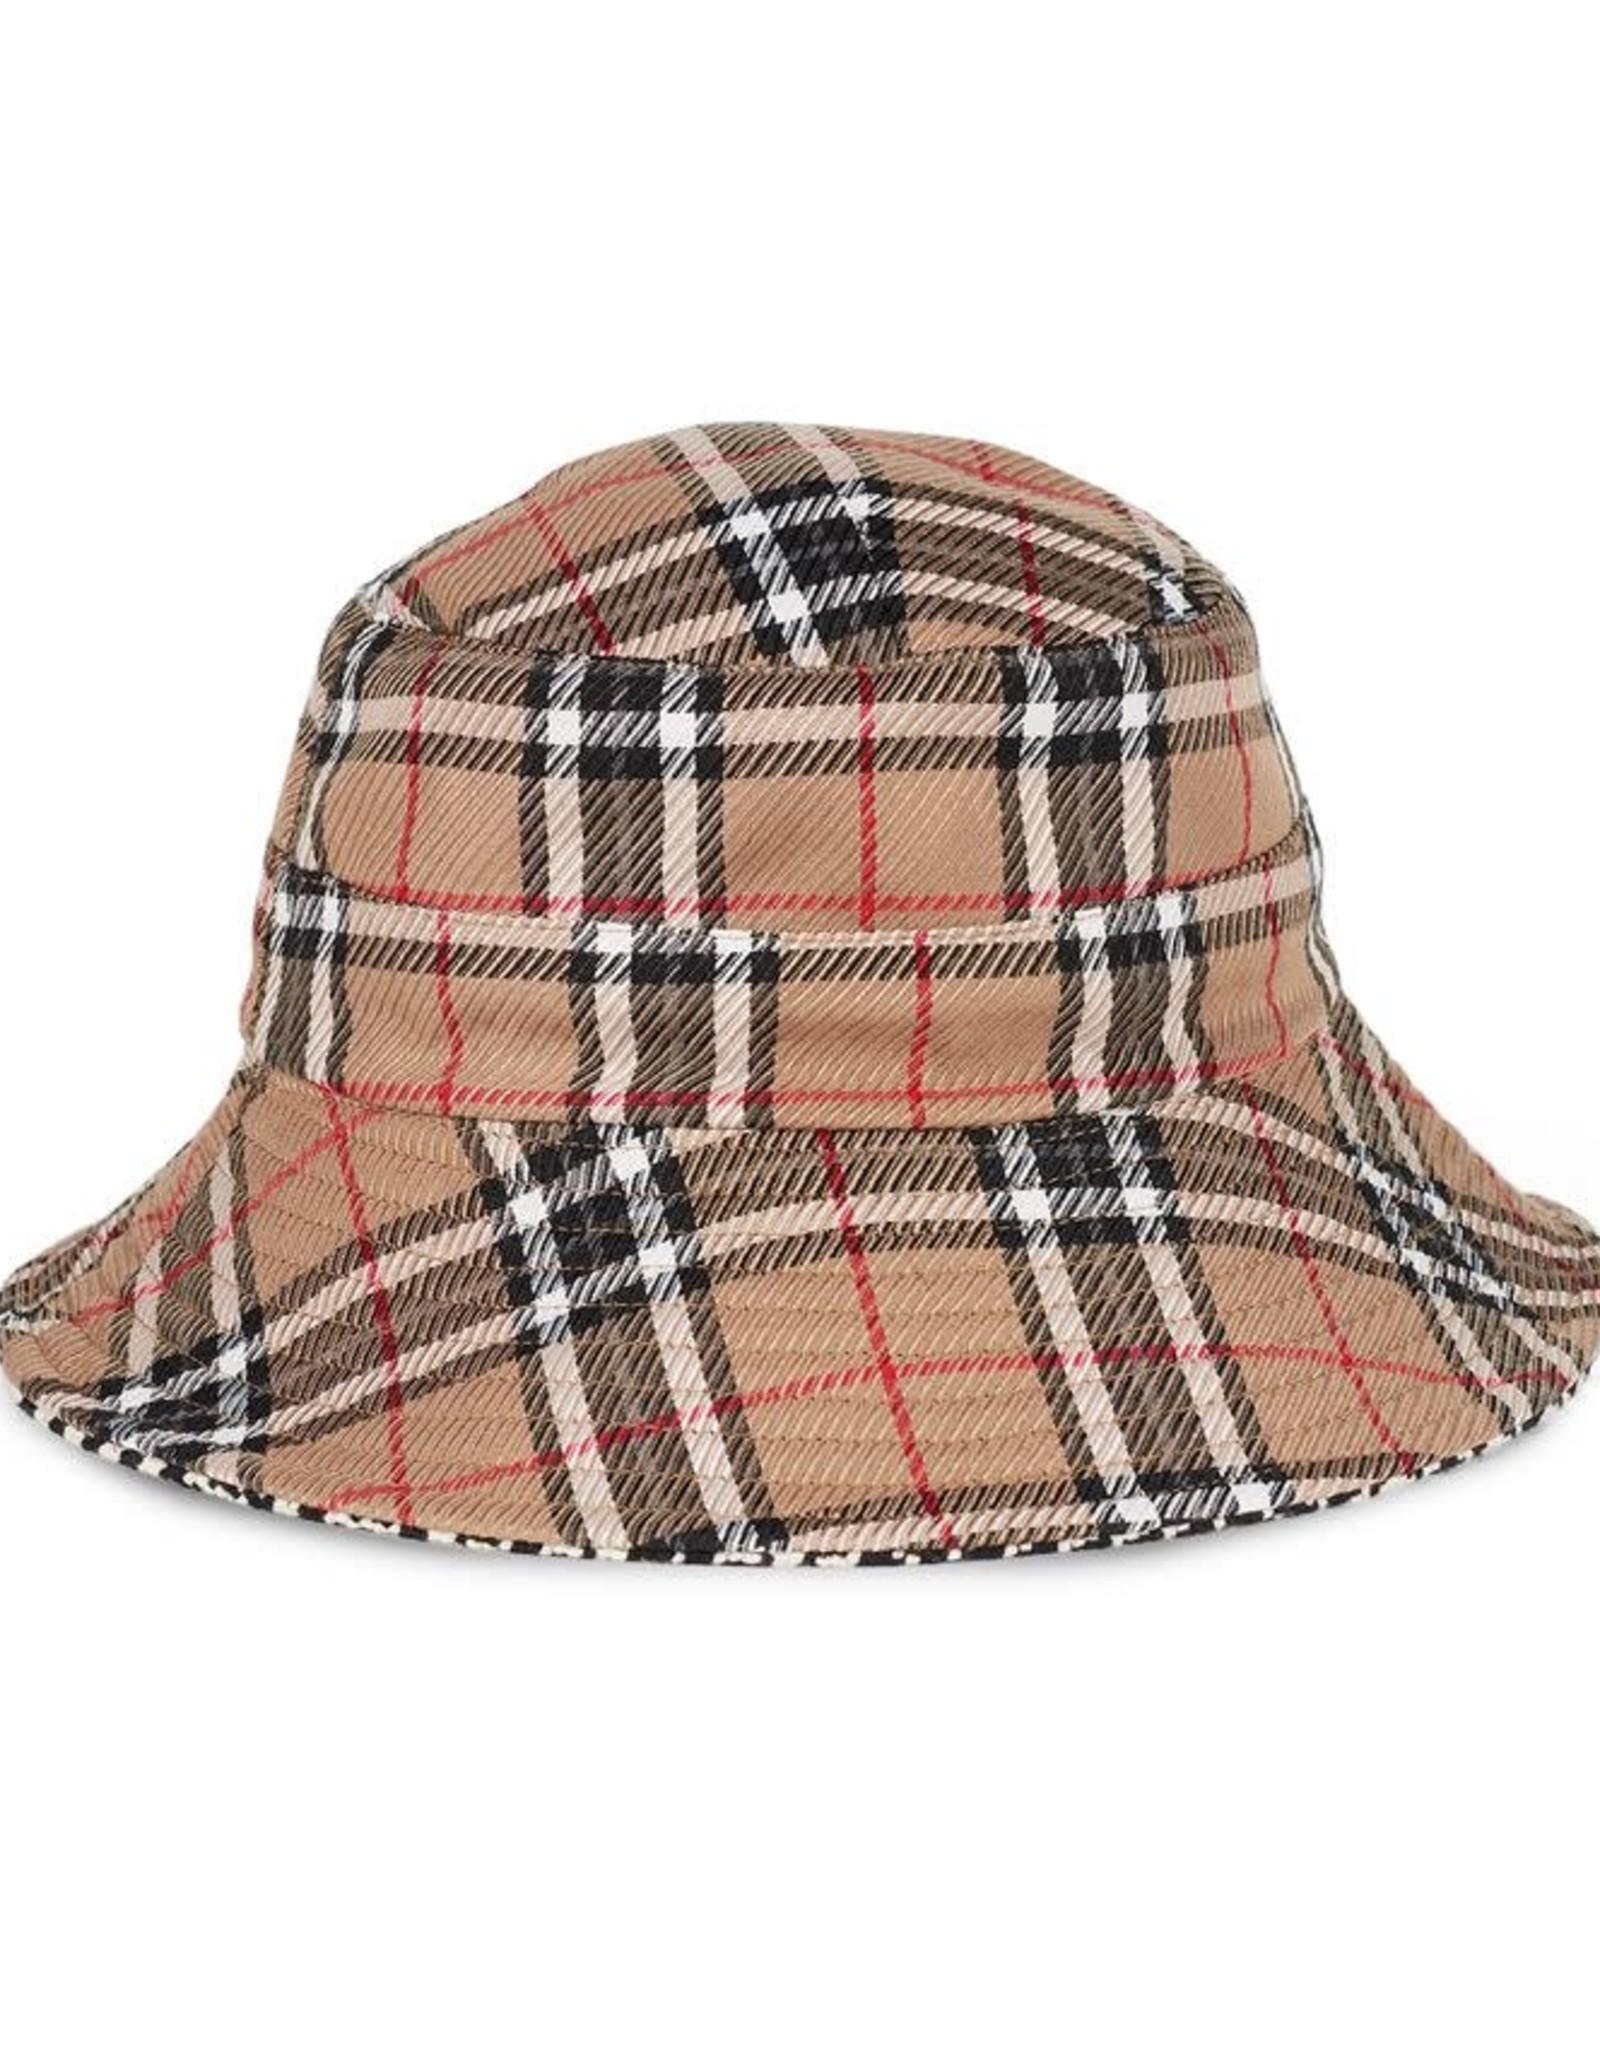 Coco & Carmen Liz Reversible Bucket Hat Plaid & Houndstooth